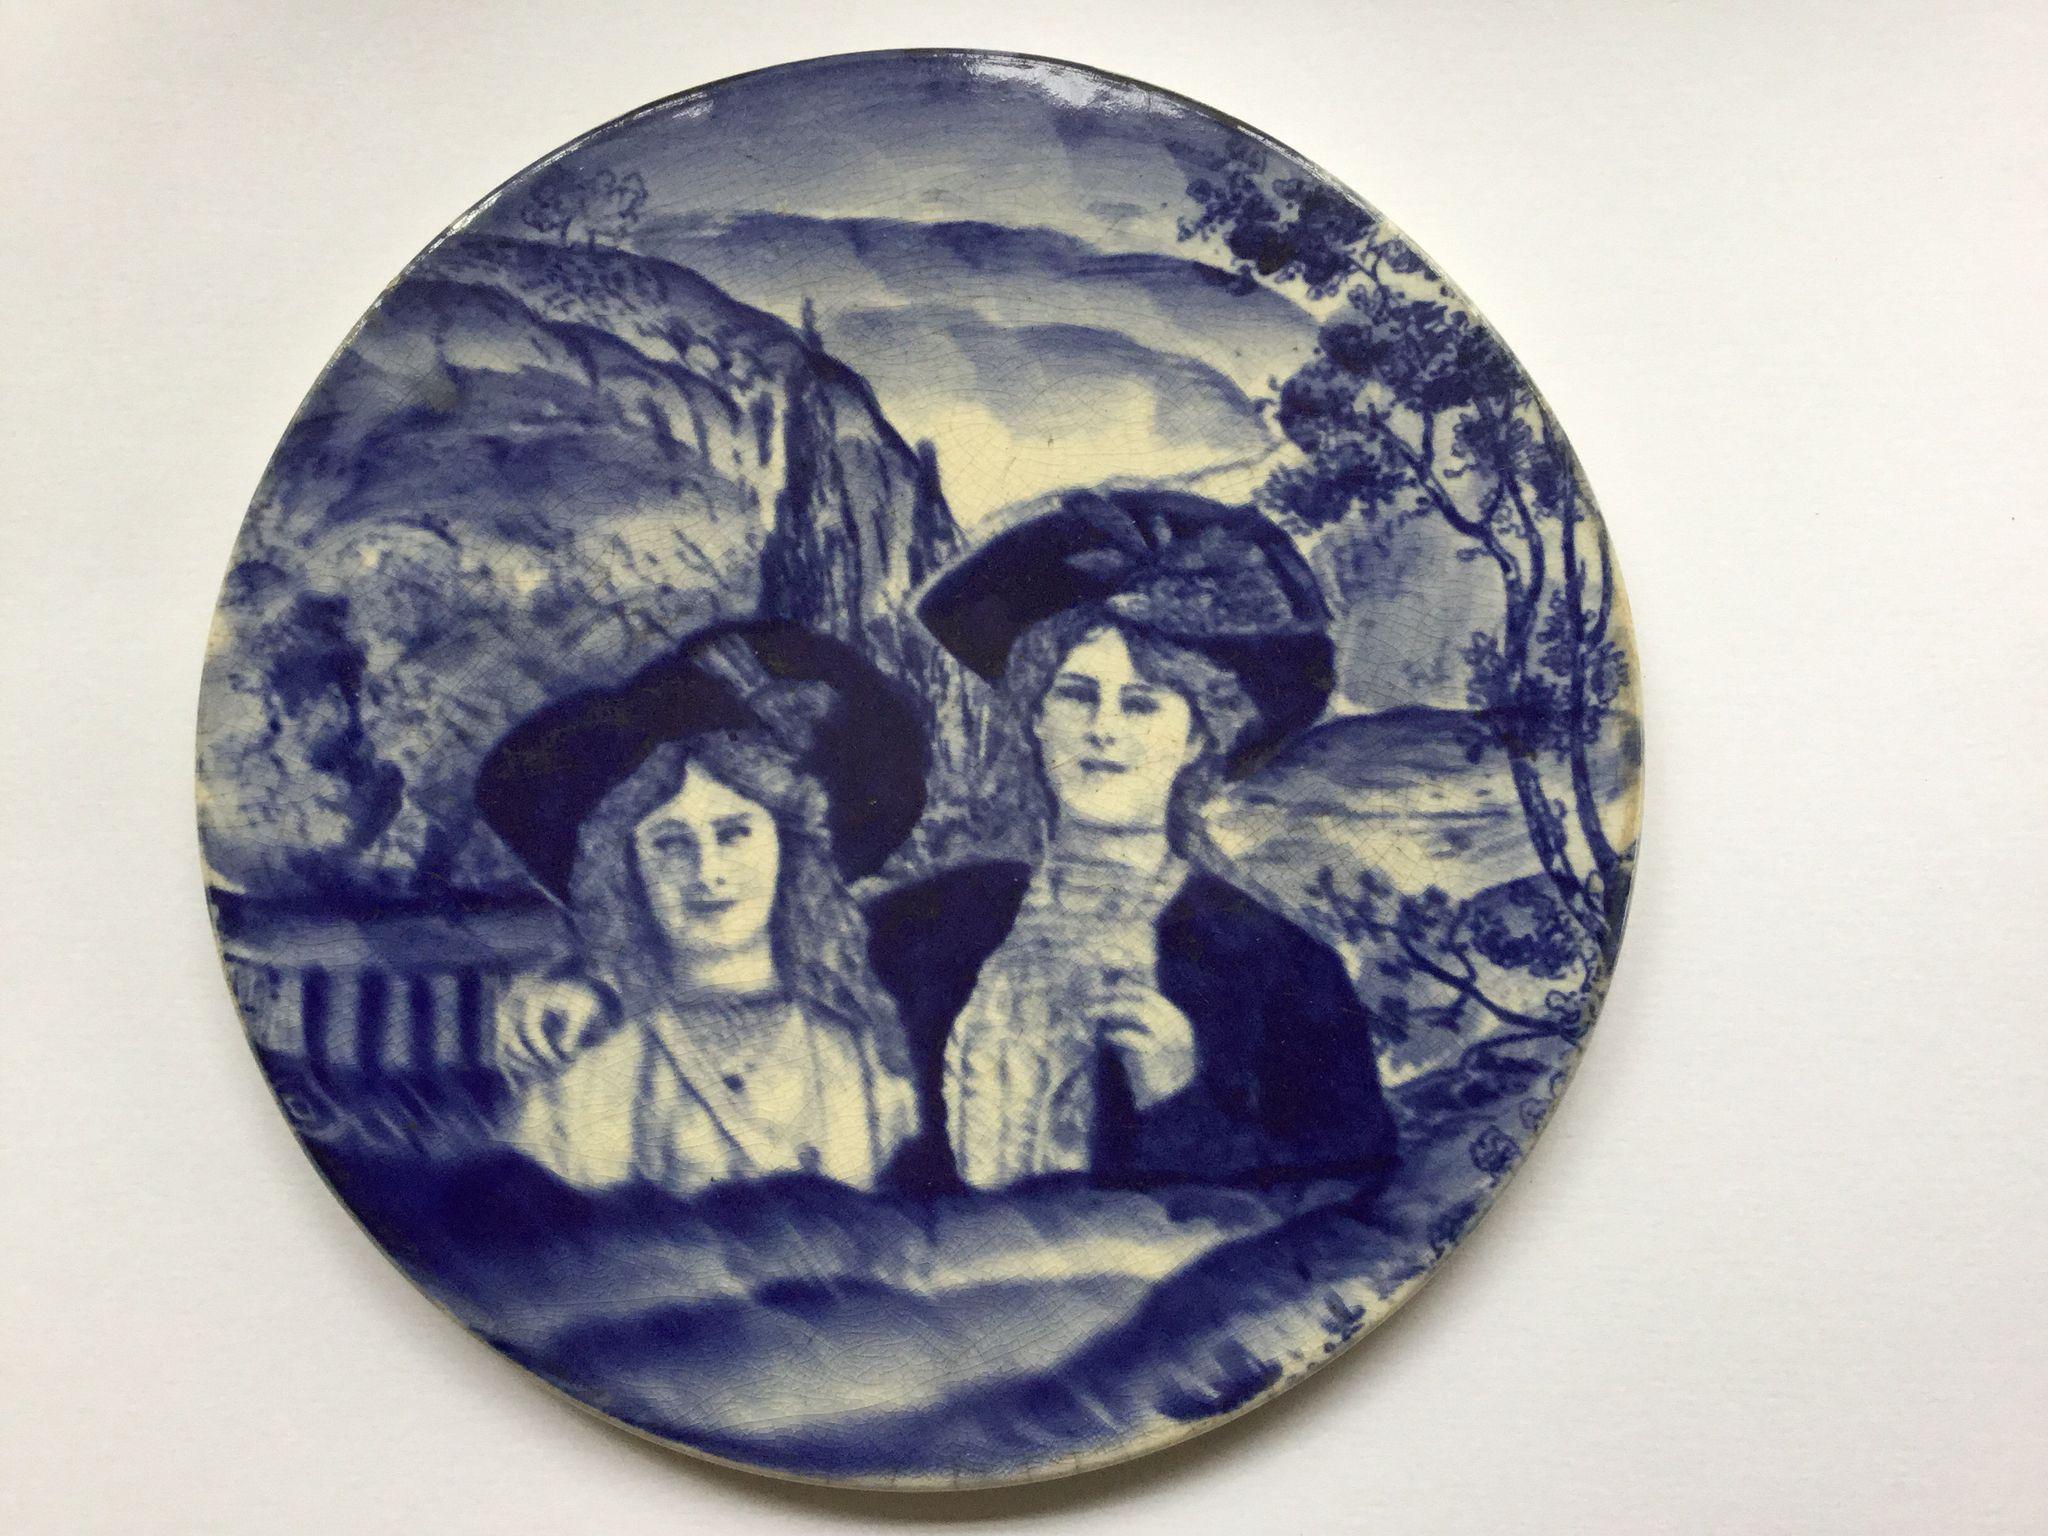 Staffordshire plaque